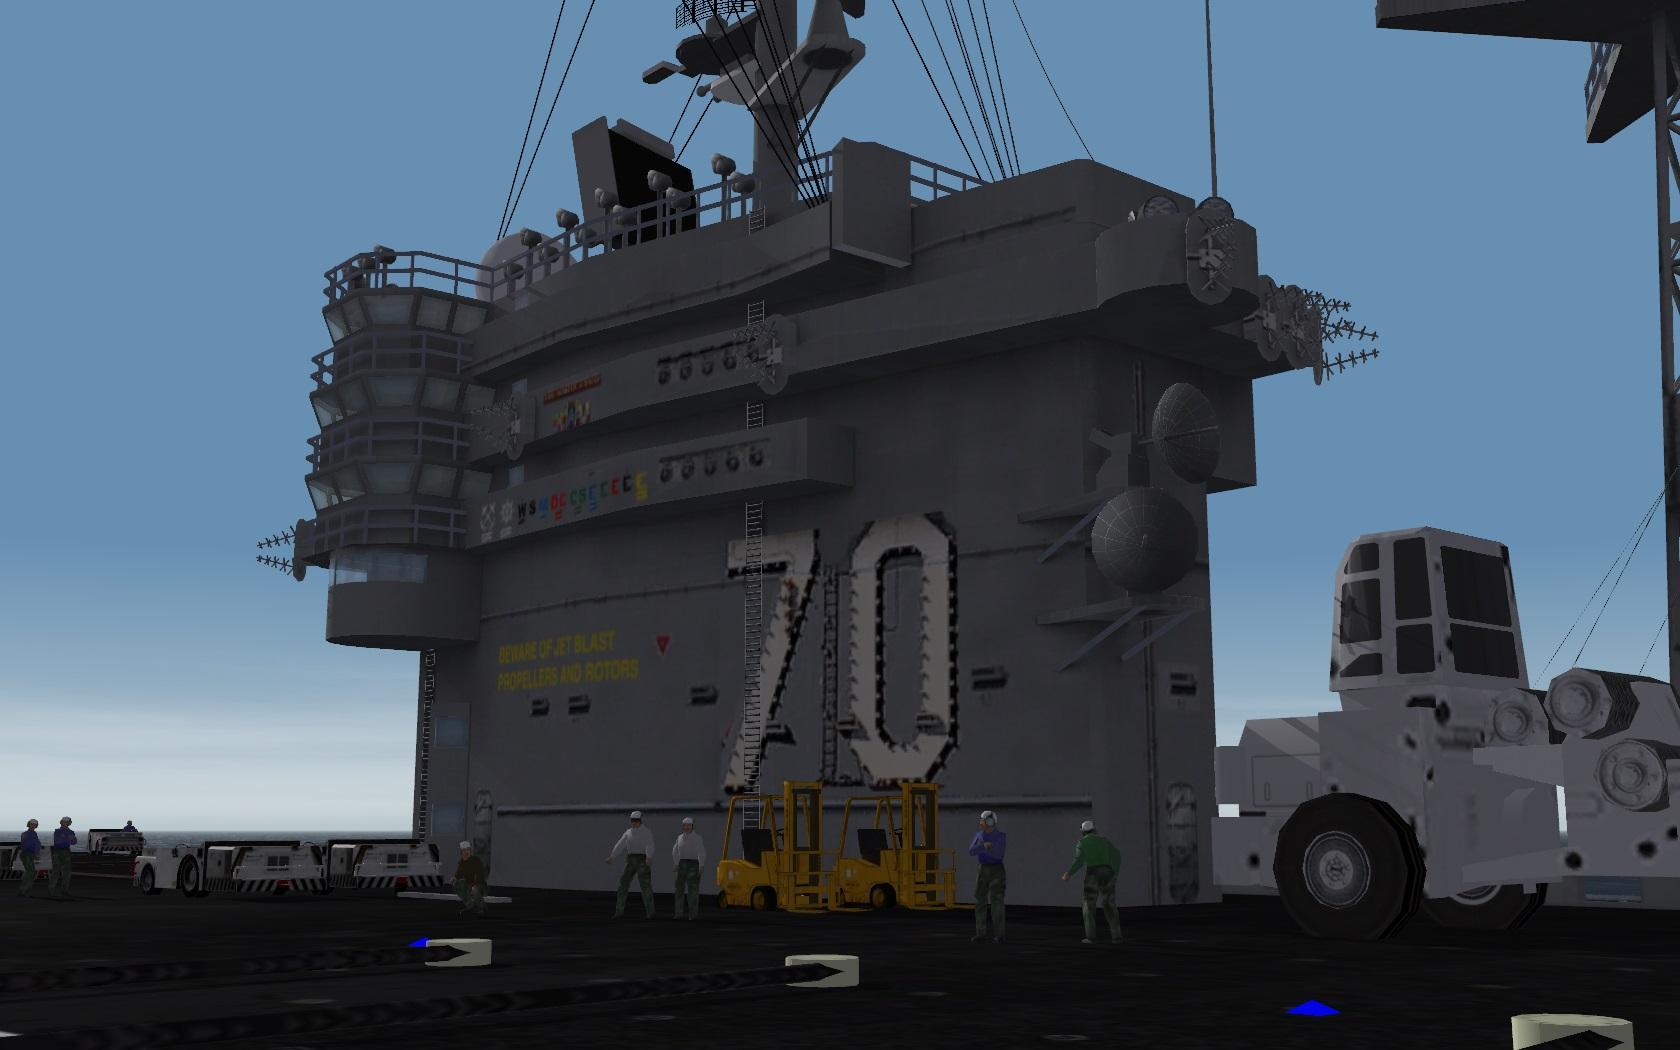 USS Carl Vinson to Relieve USS George H.W. Bush